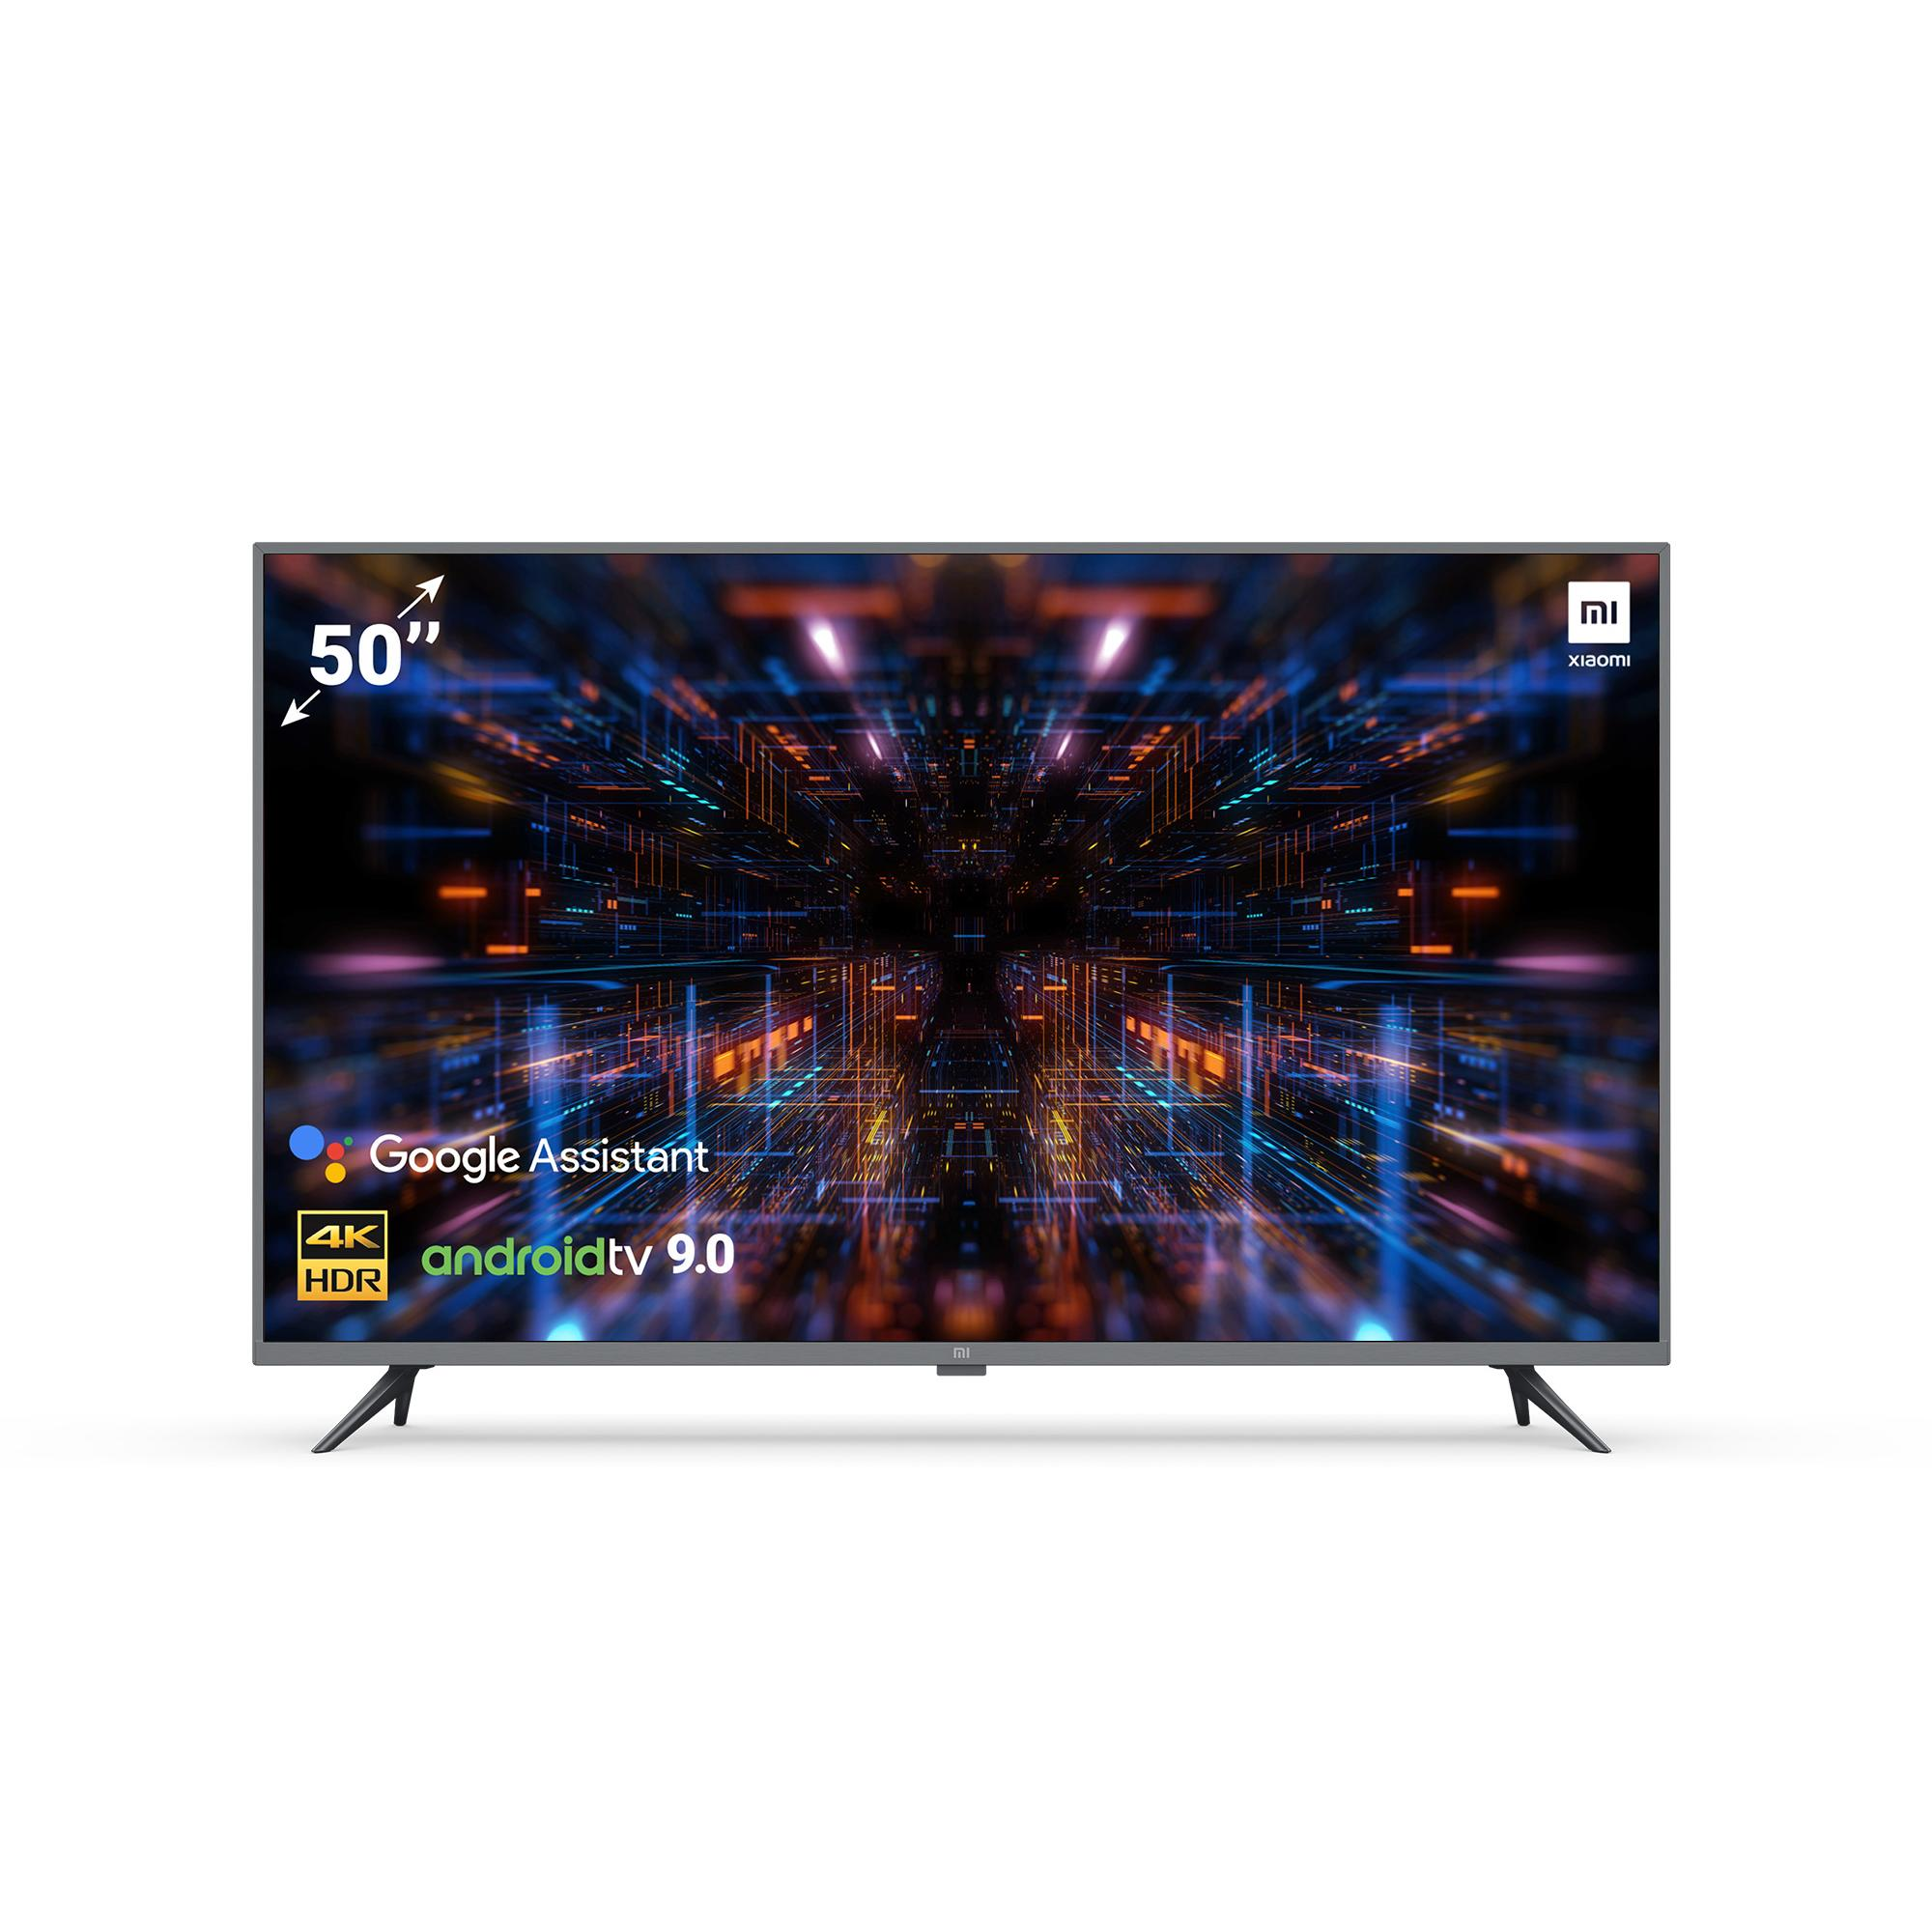 "Телевизор 50"" Xiaomi Mi TV UHD 4S 50"" 3840x2160 - купить за 11463 грн   интернет-магазин Эра Электроники"